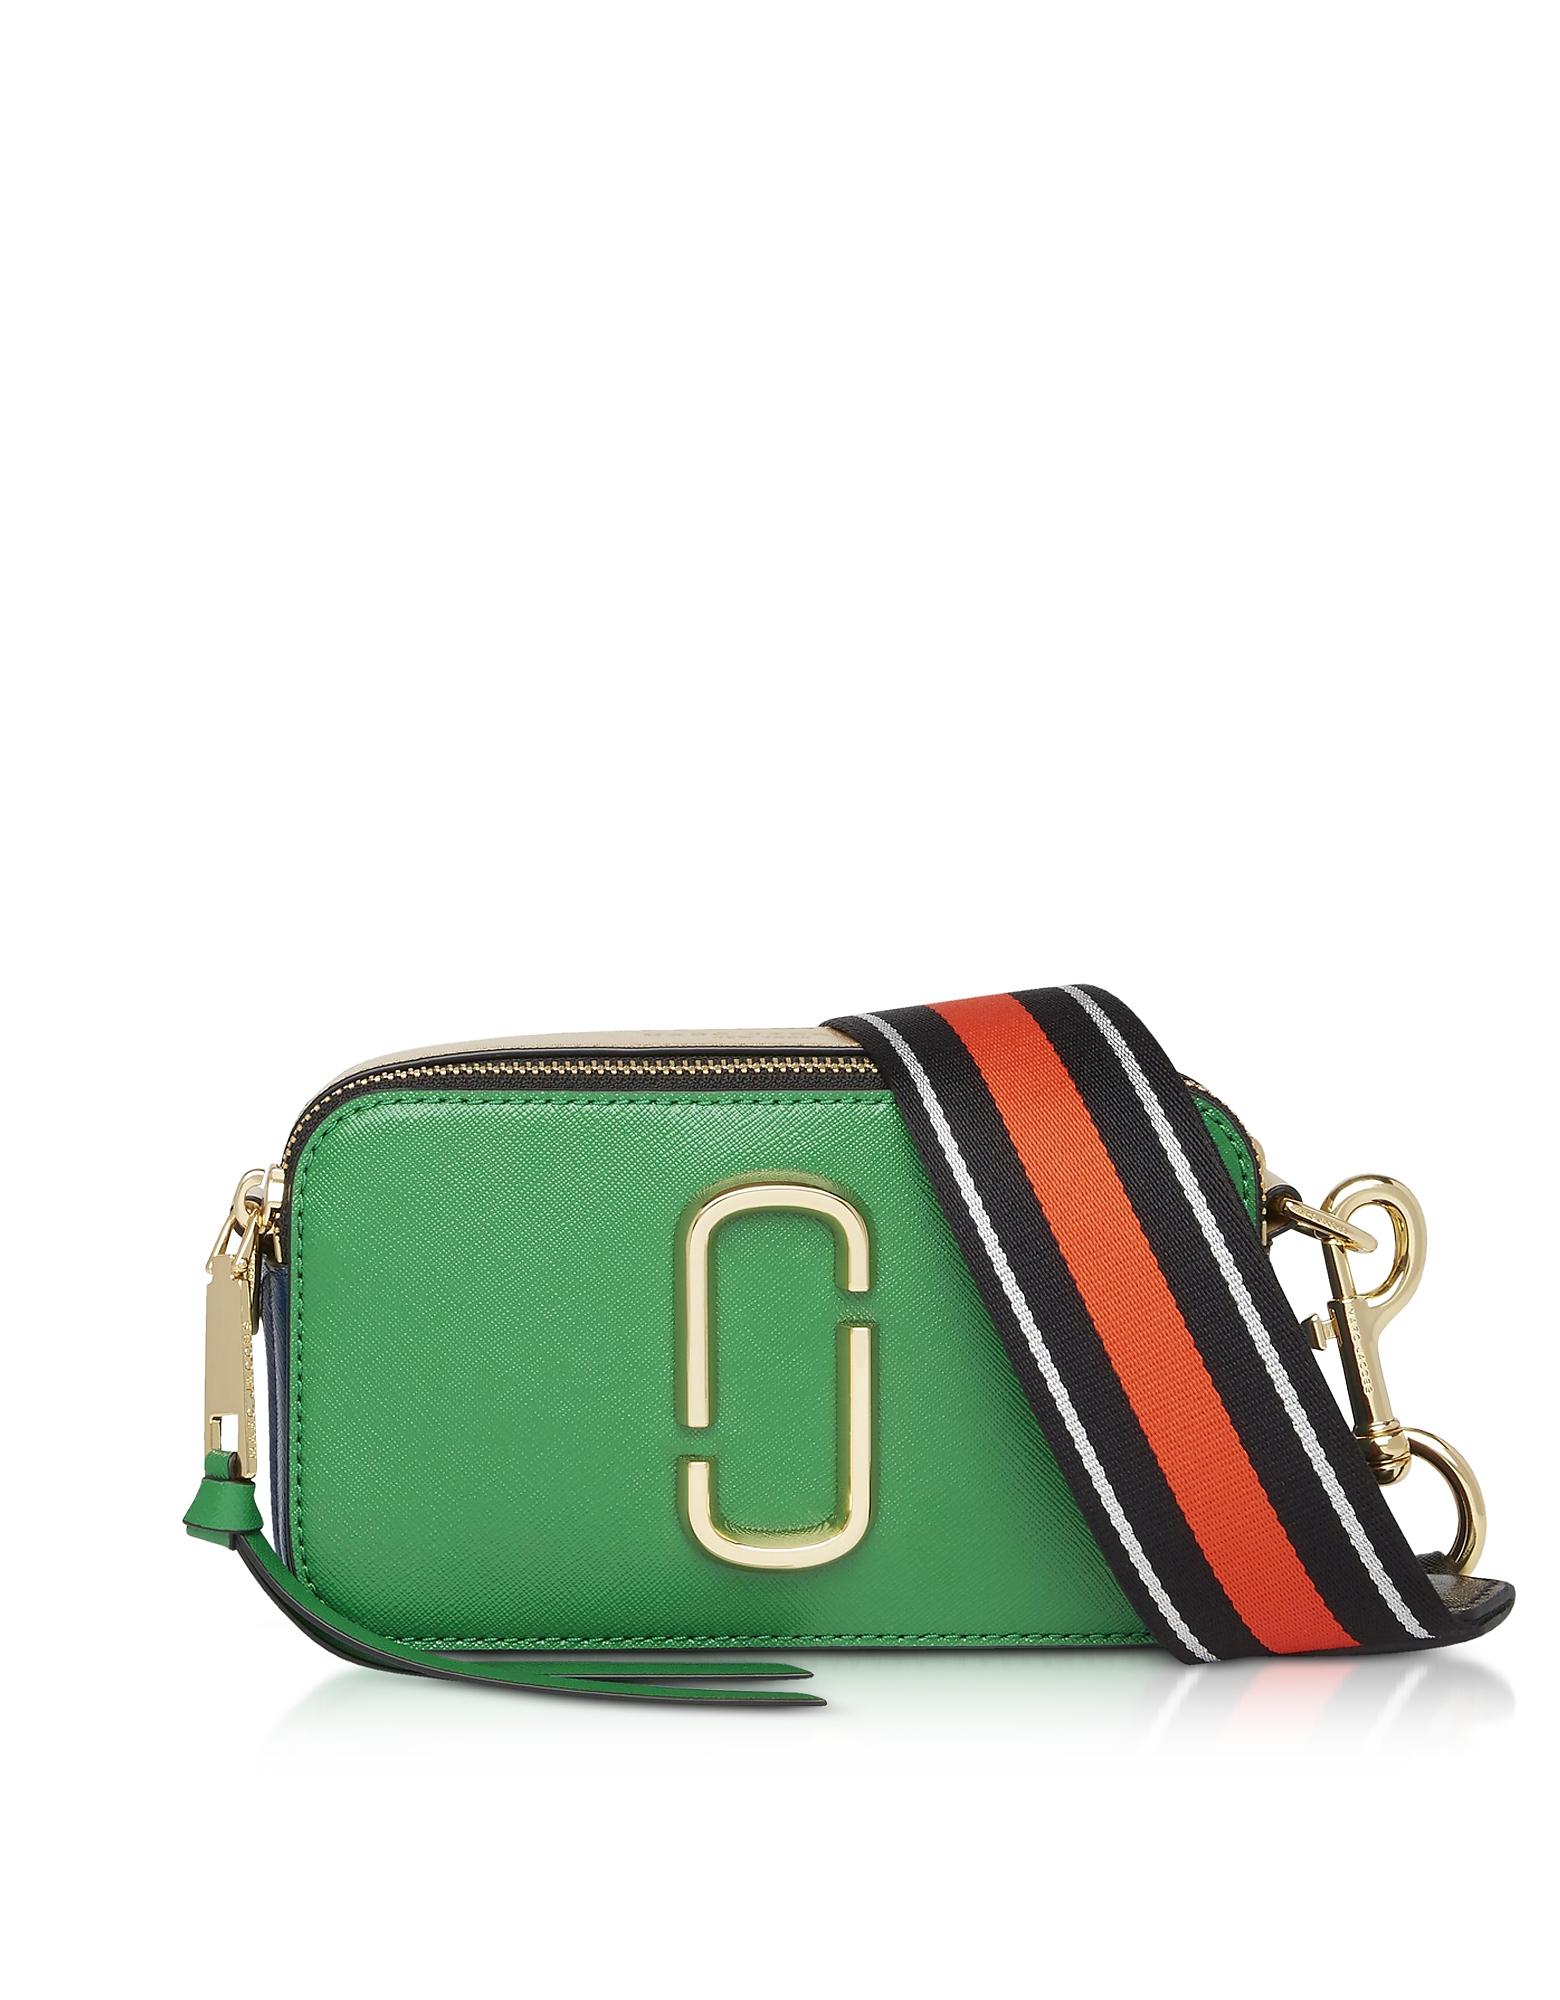 Logo Strap Snapshot Camera Bag in Pepper Green Multi